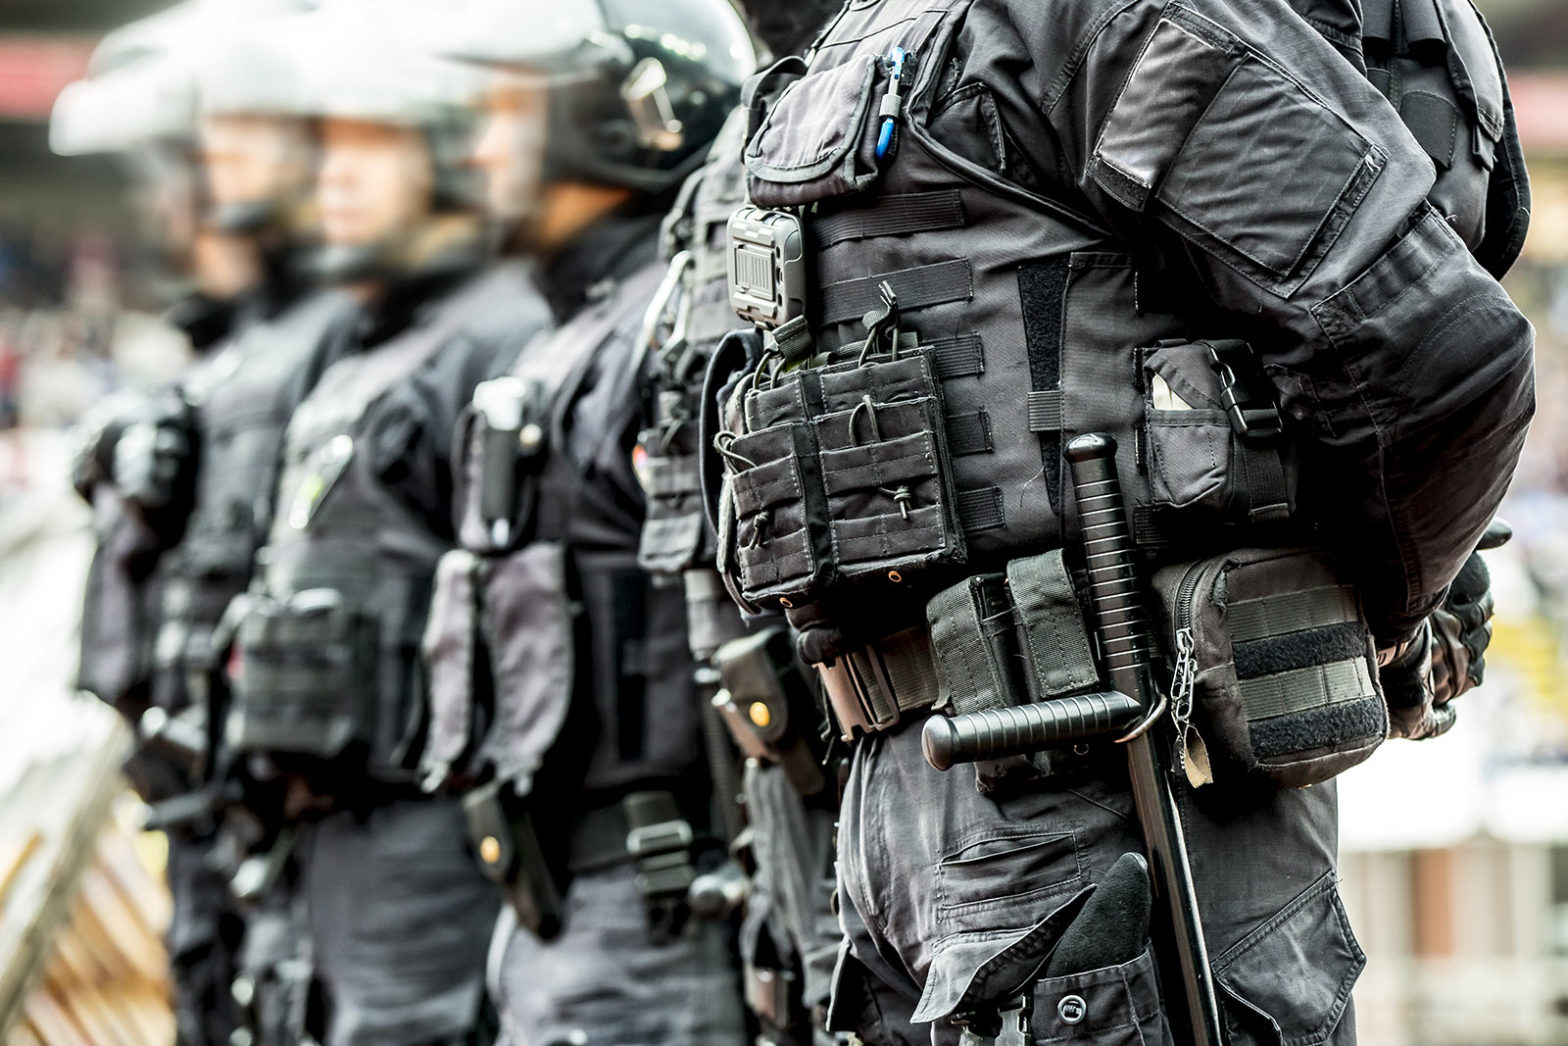 Terrorism police